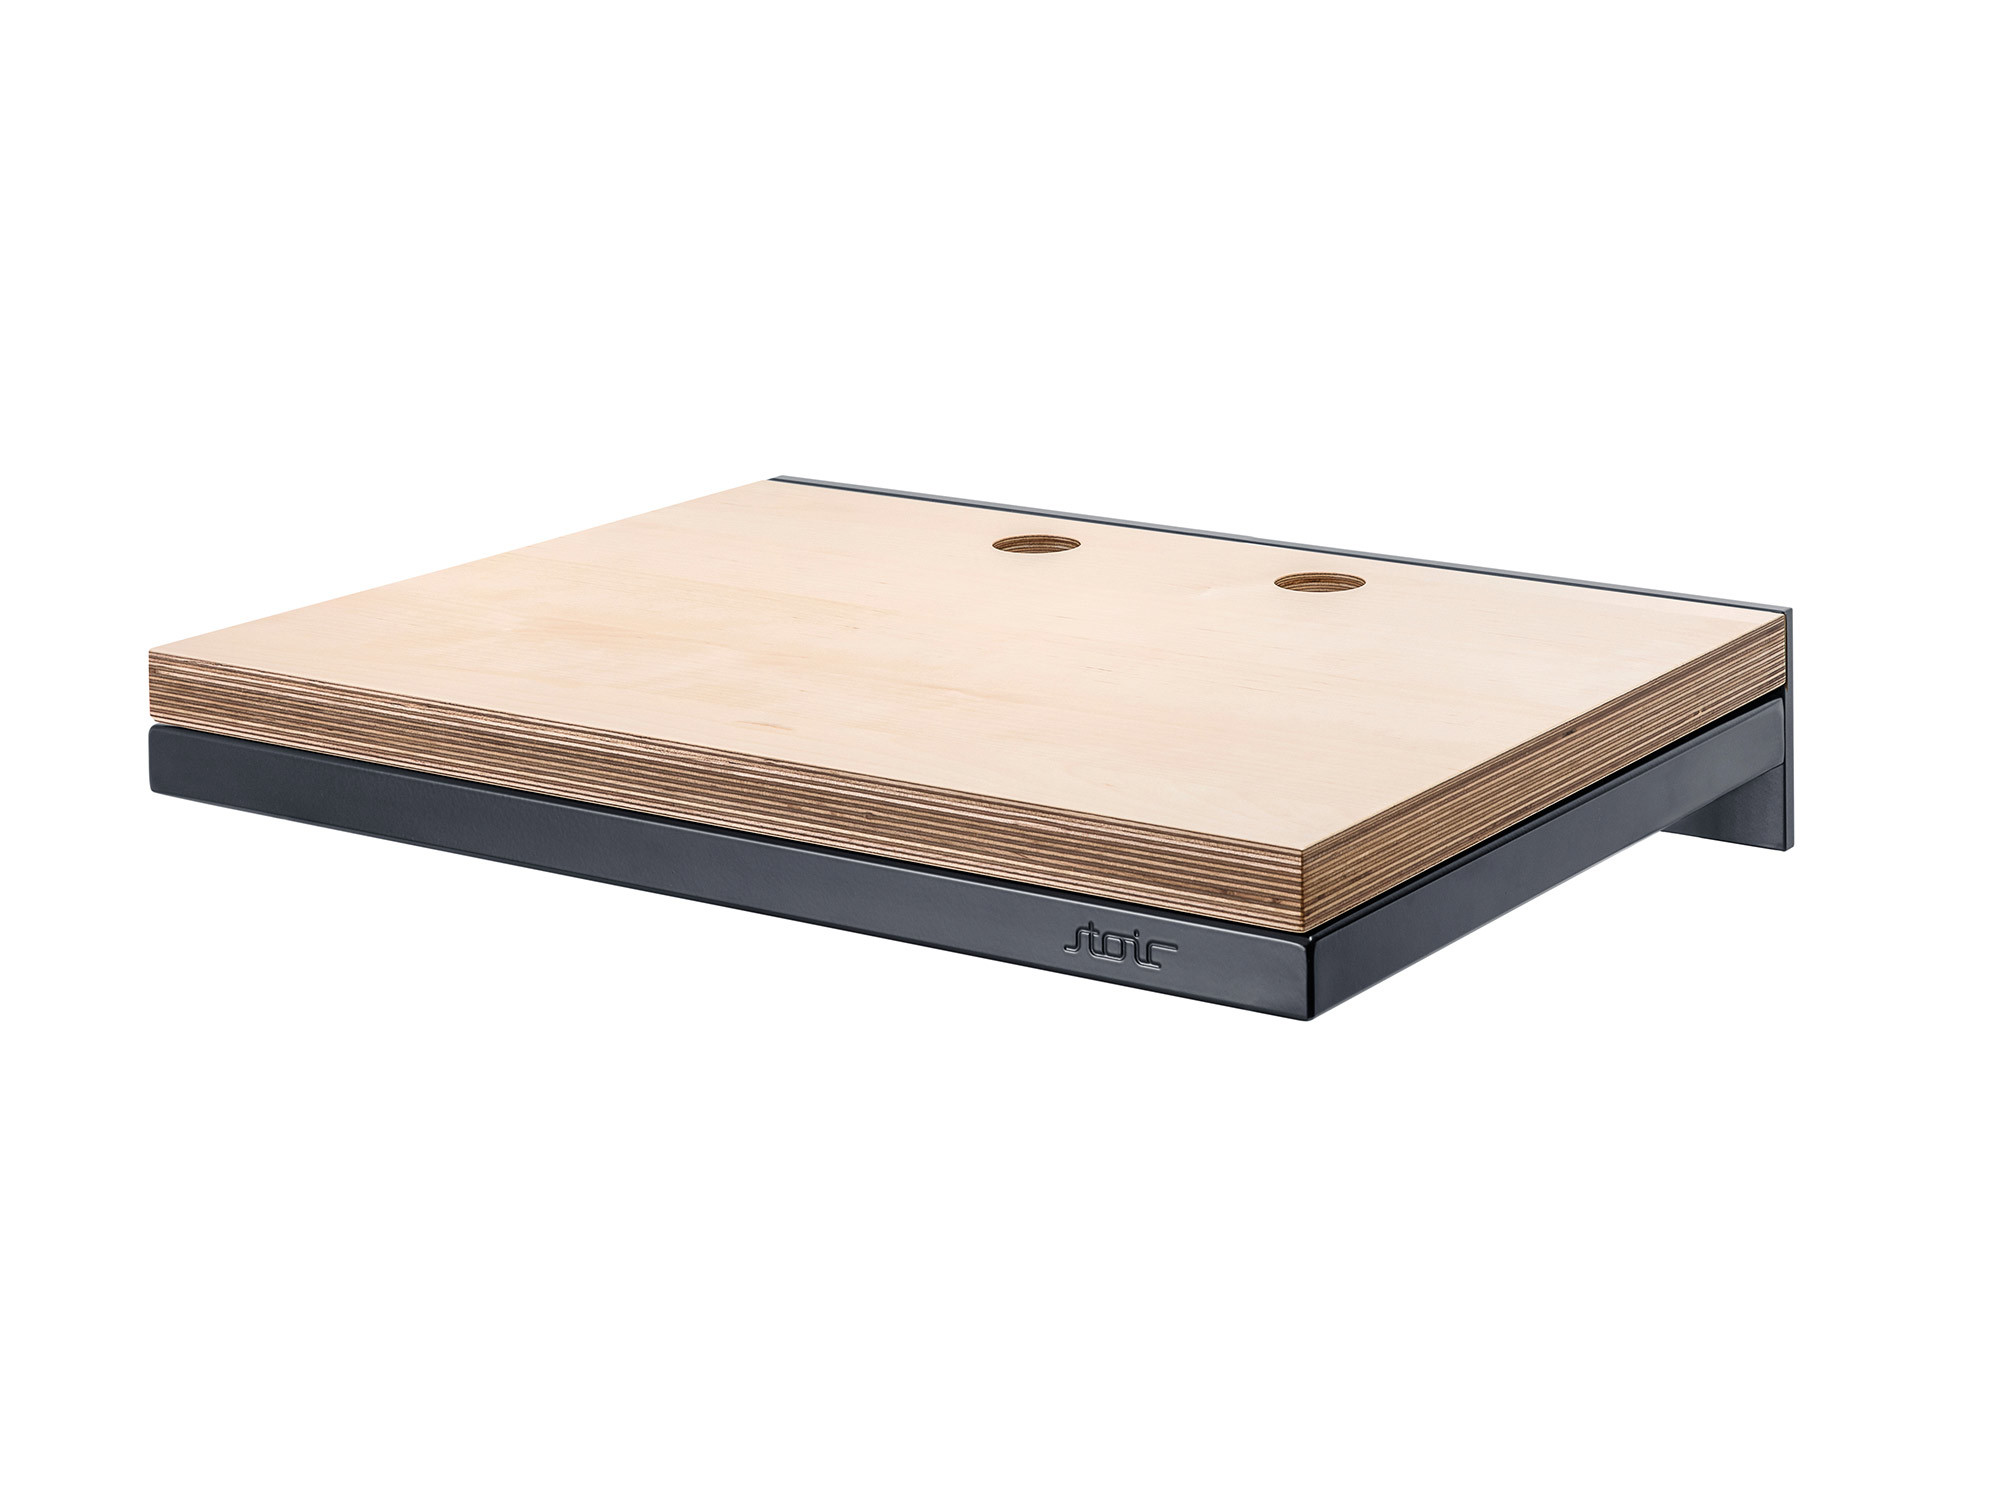 Inakustik Stoic Stainless steel frame, 40x55, Slate